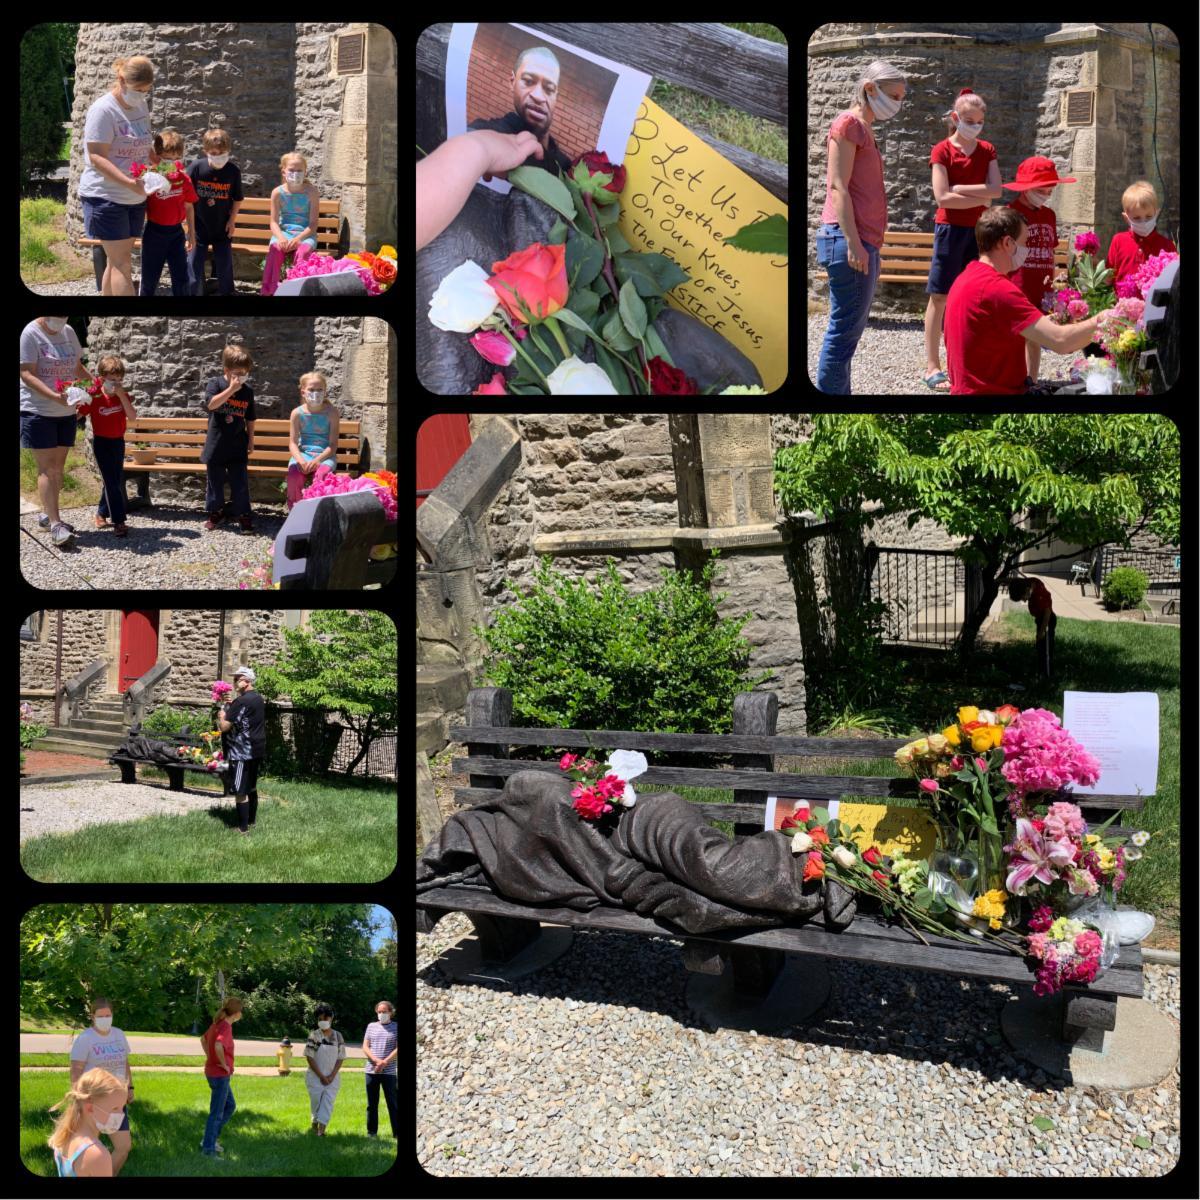 Calvary Cincinnati honors those persecuted